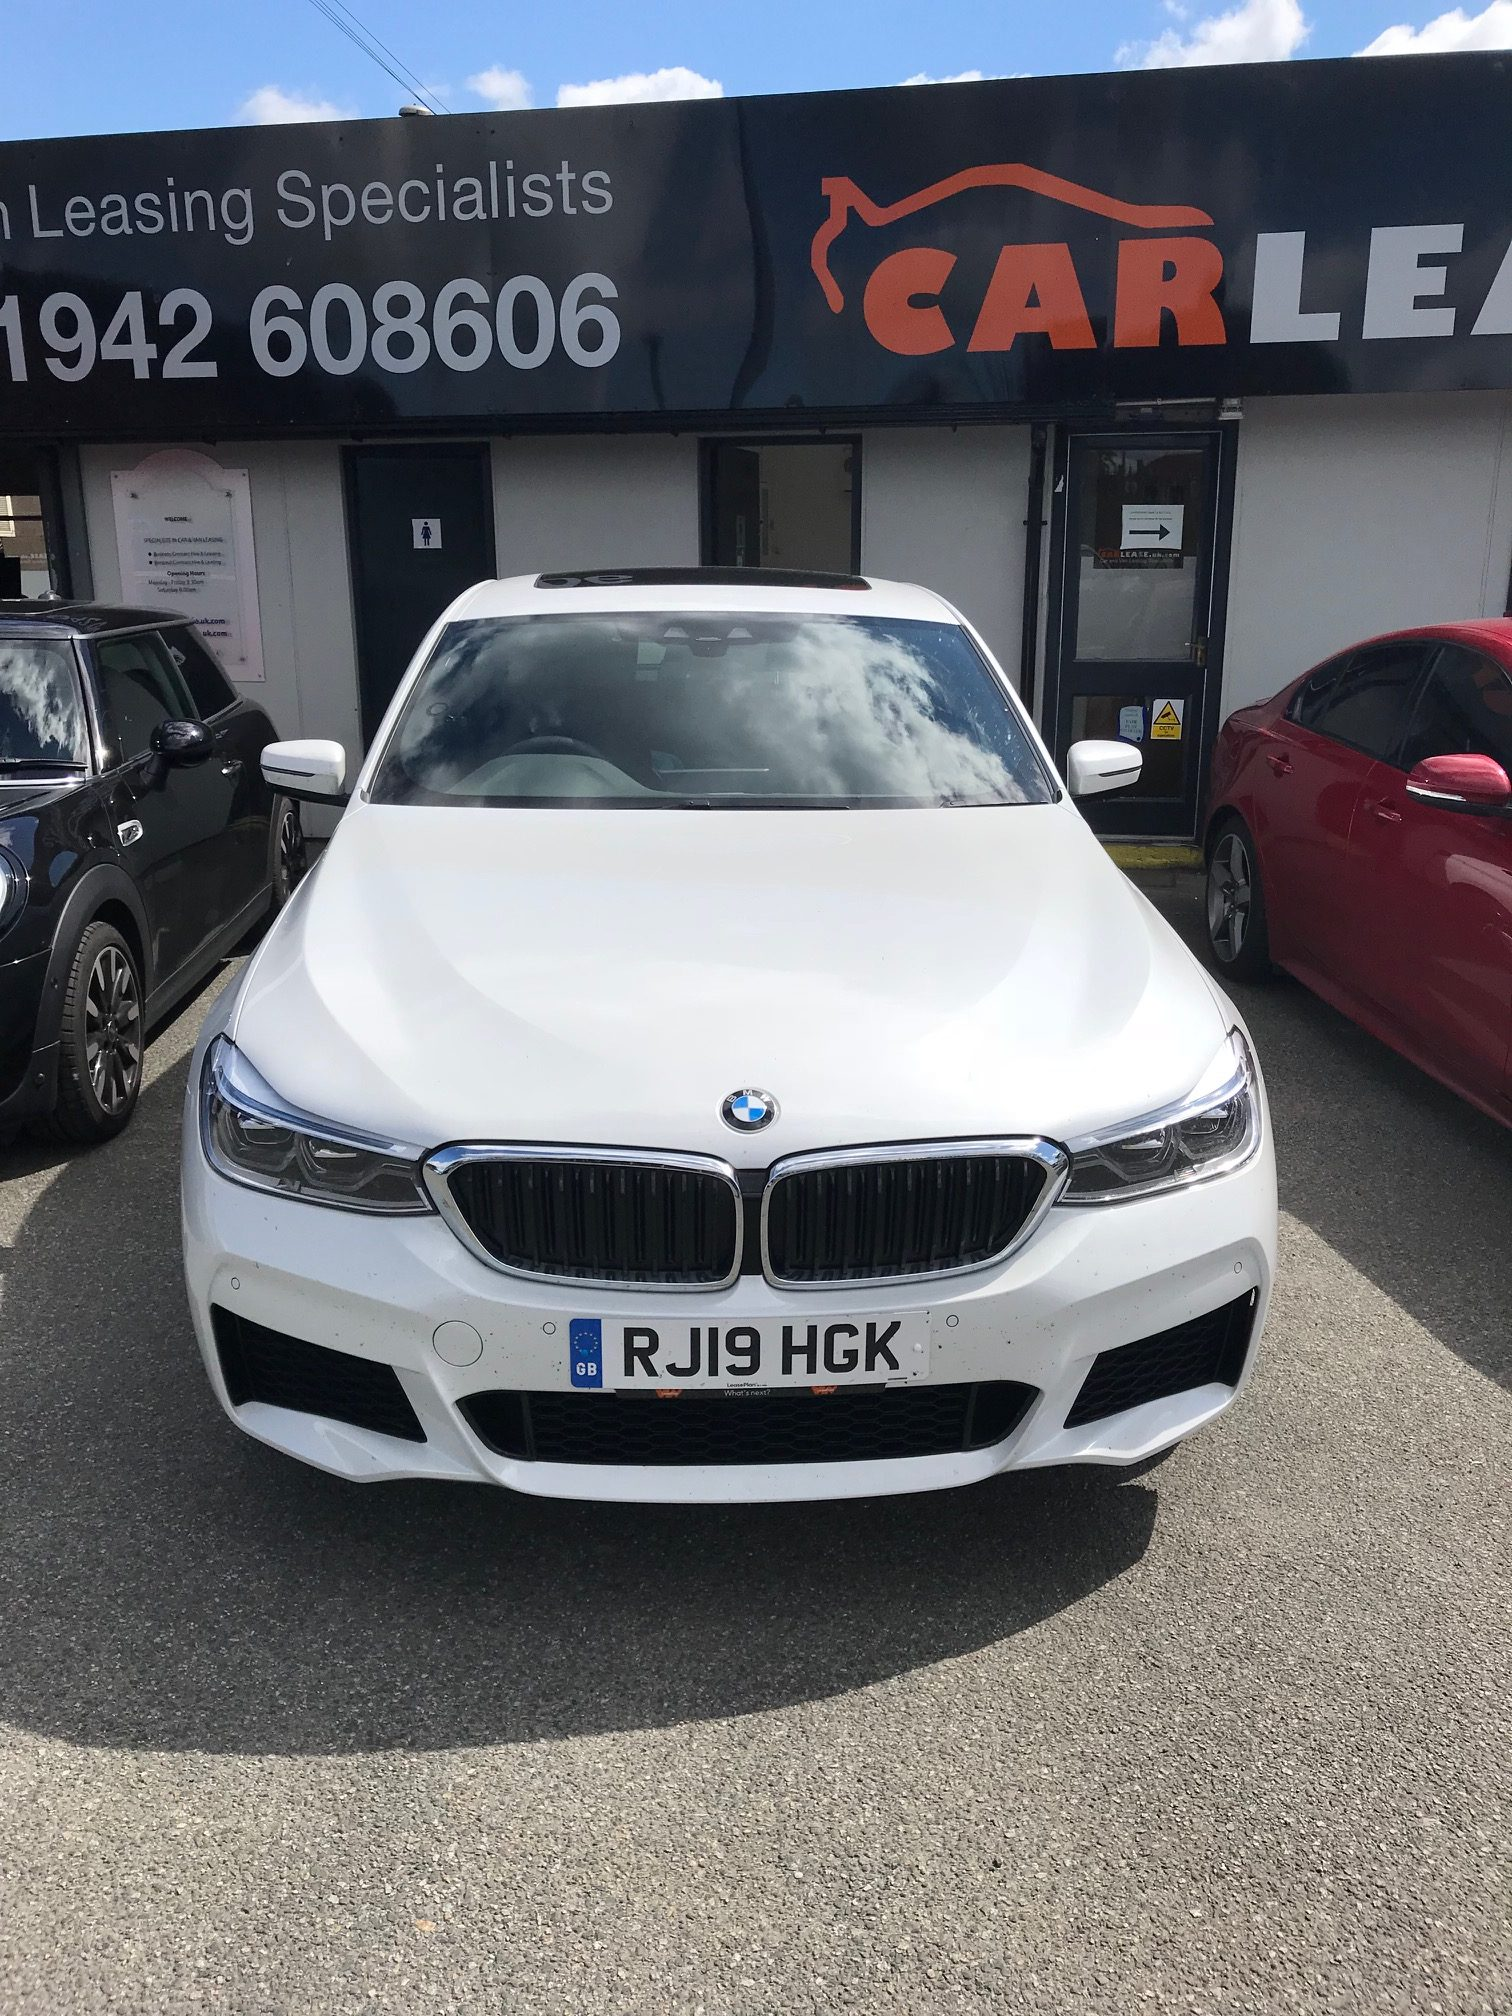 BMW 6 SERIES GRAN TURISMO DIESEL HATCHBACK 620d M Sport 5dr Auto Car Leasing